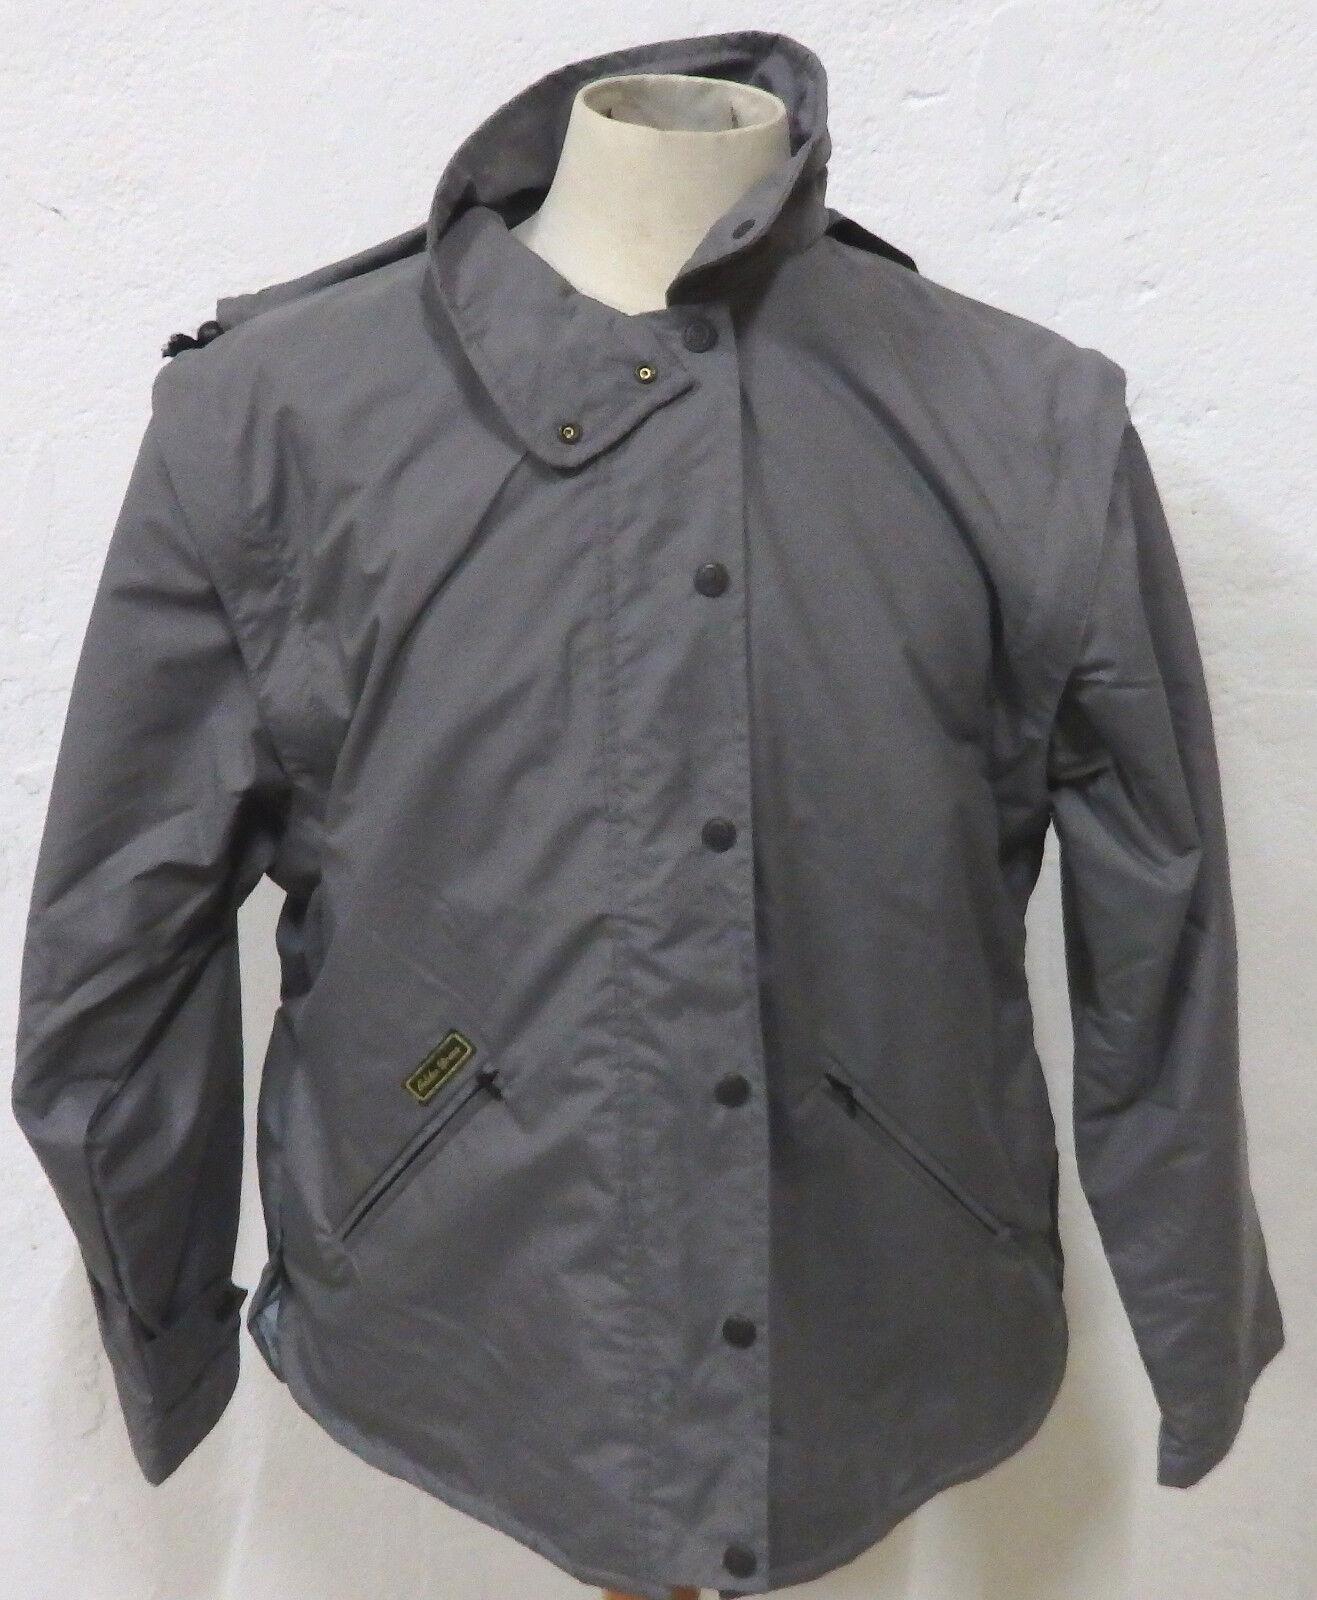 Golden dress reitjacke lluvia chaqueta, gris, gris, gris, talla s, sealand  A la venta con descuento del 70%.